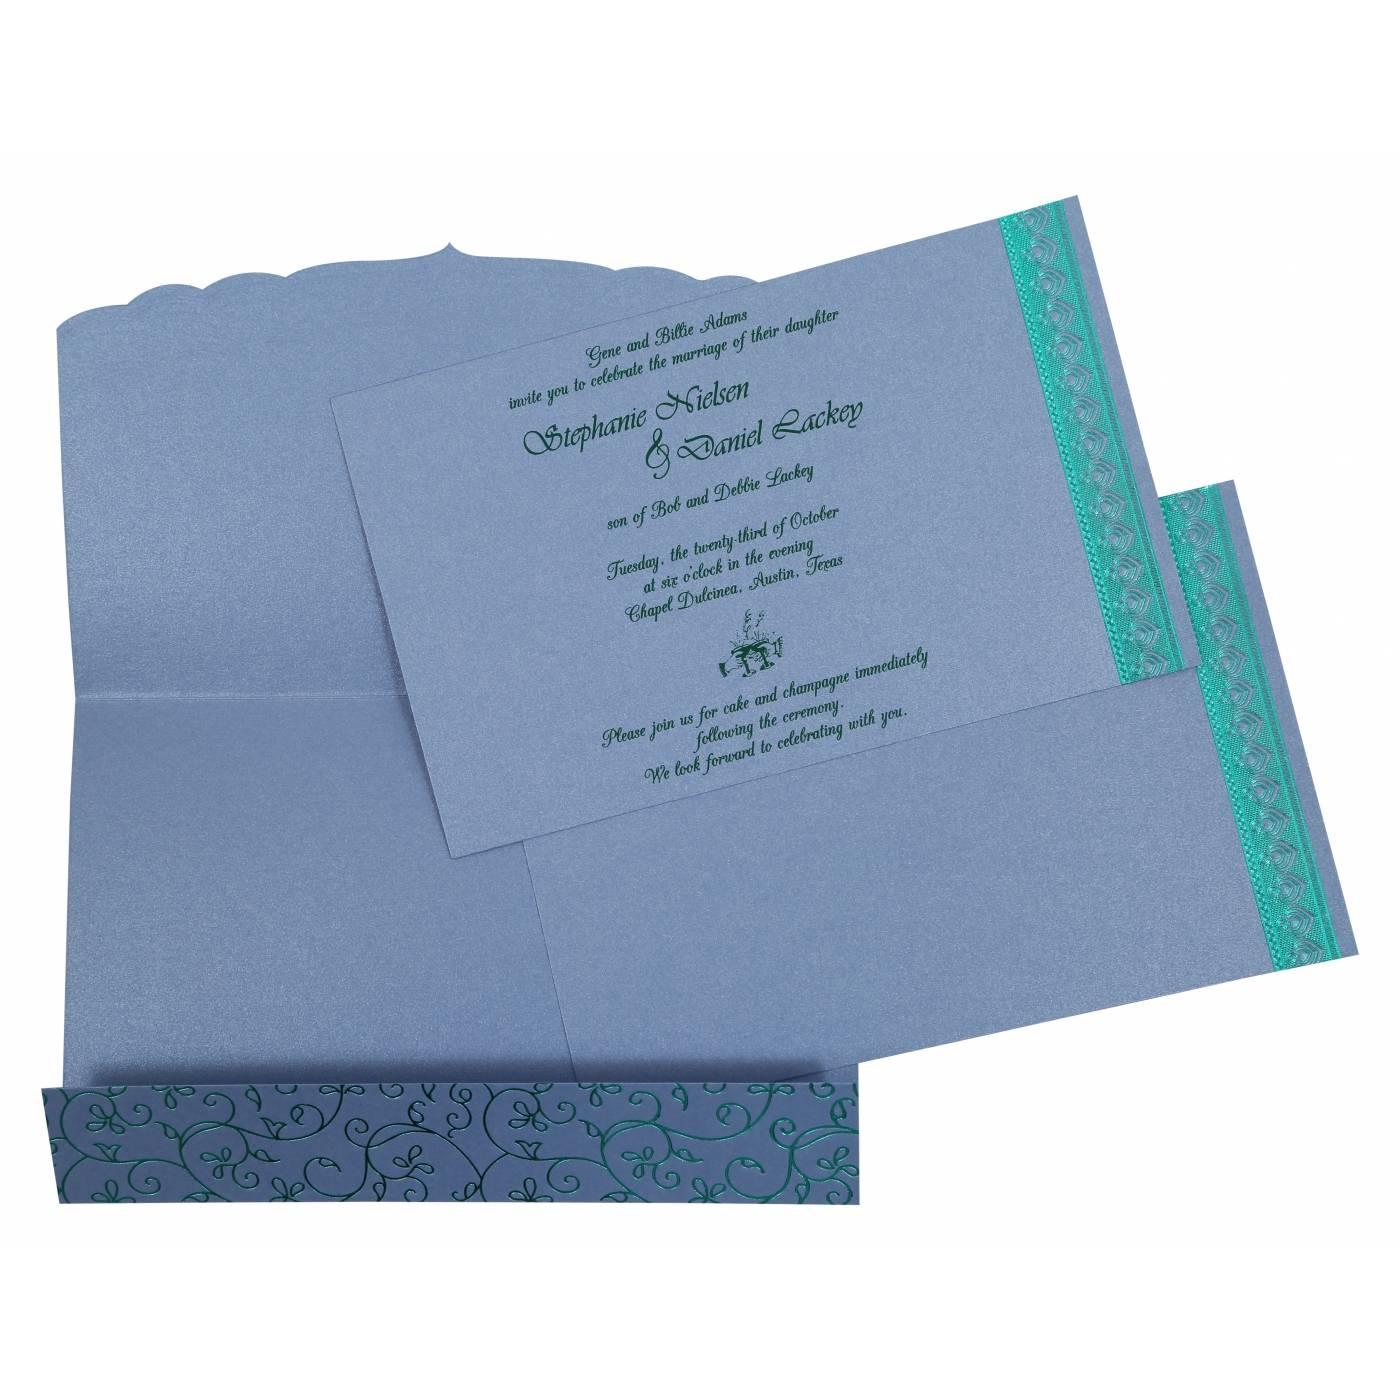 SKY BLUE SHIMMERY FOIL STAMPED WEDDING INVITATION : CG-806D - IndianWeddingCards